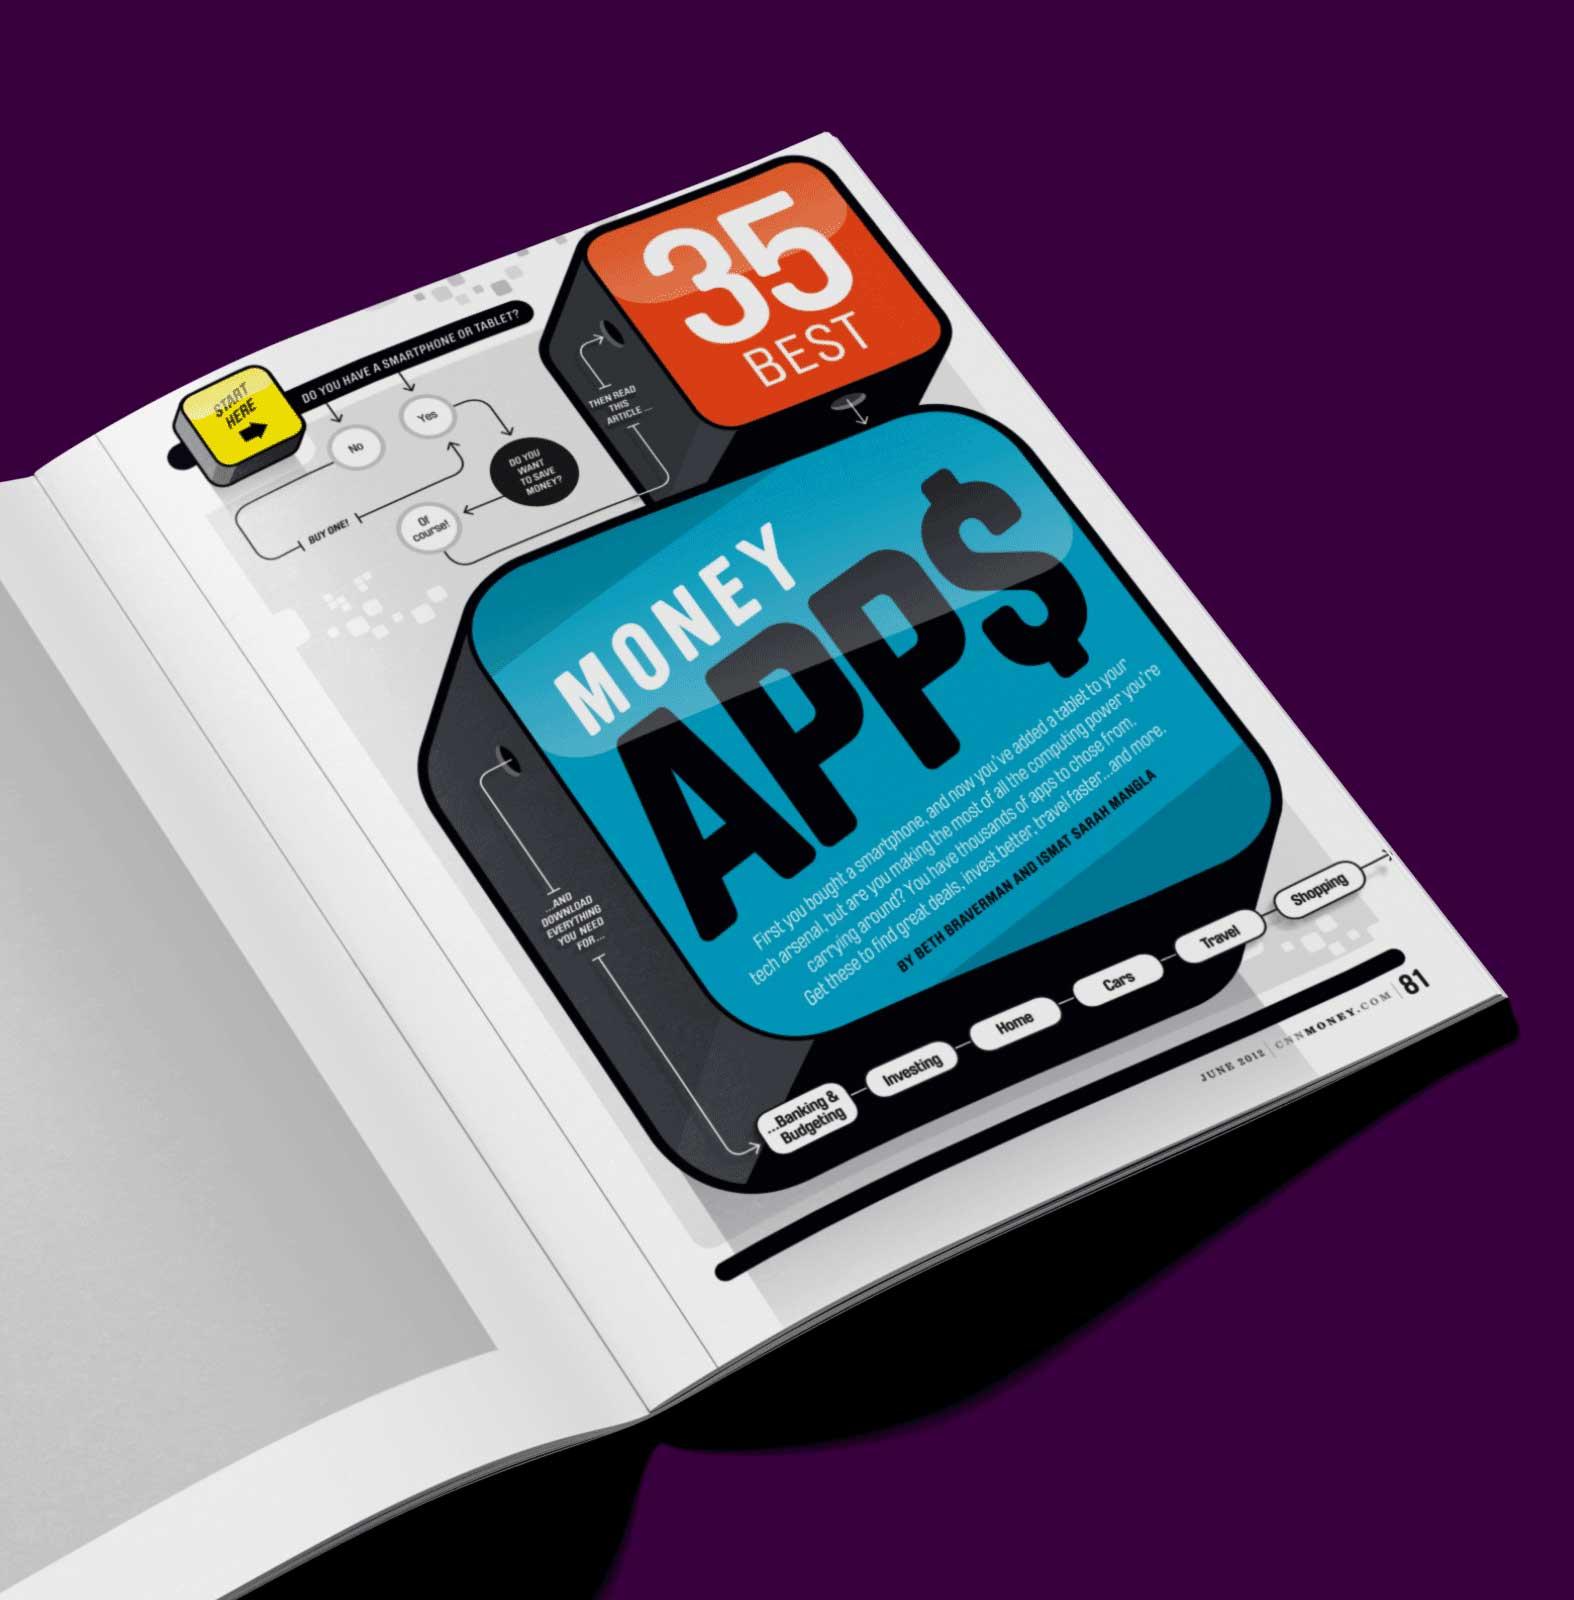 moneyopenersingle_apps.jpg